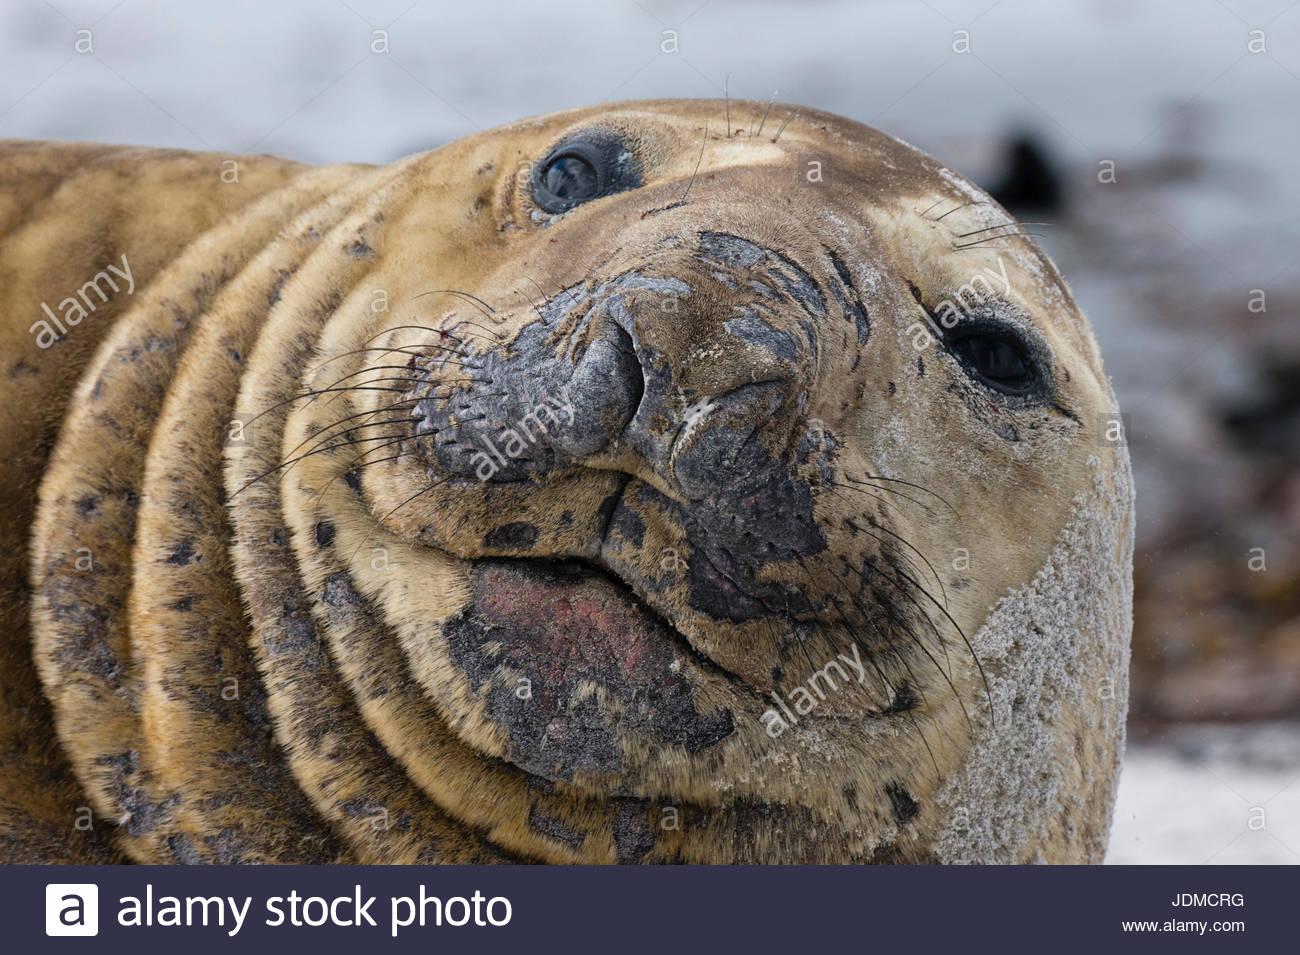 A southern elephant seal , Mirounga leonina, looks into camera. - Stock Image